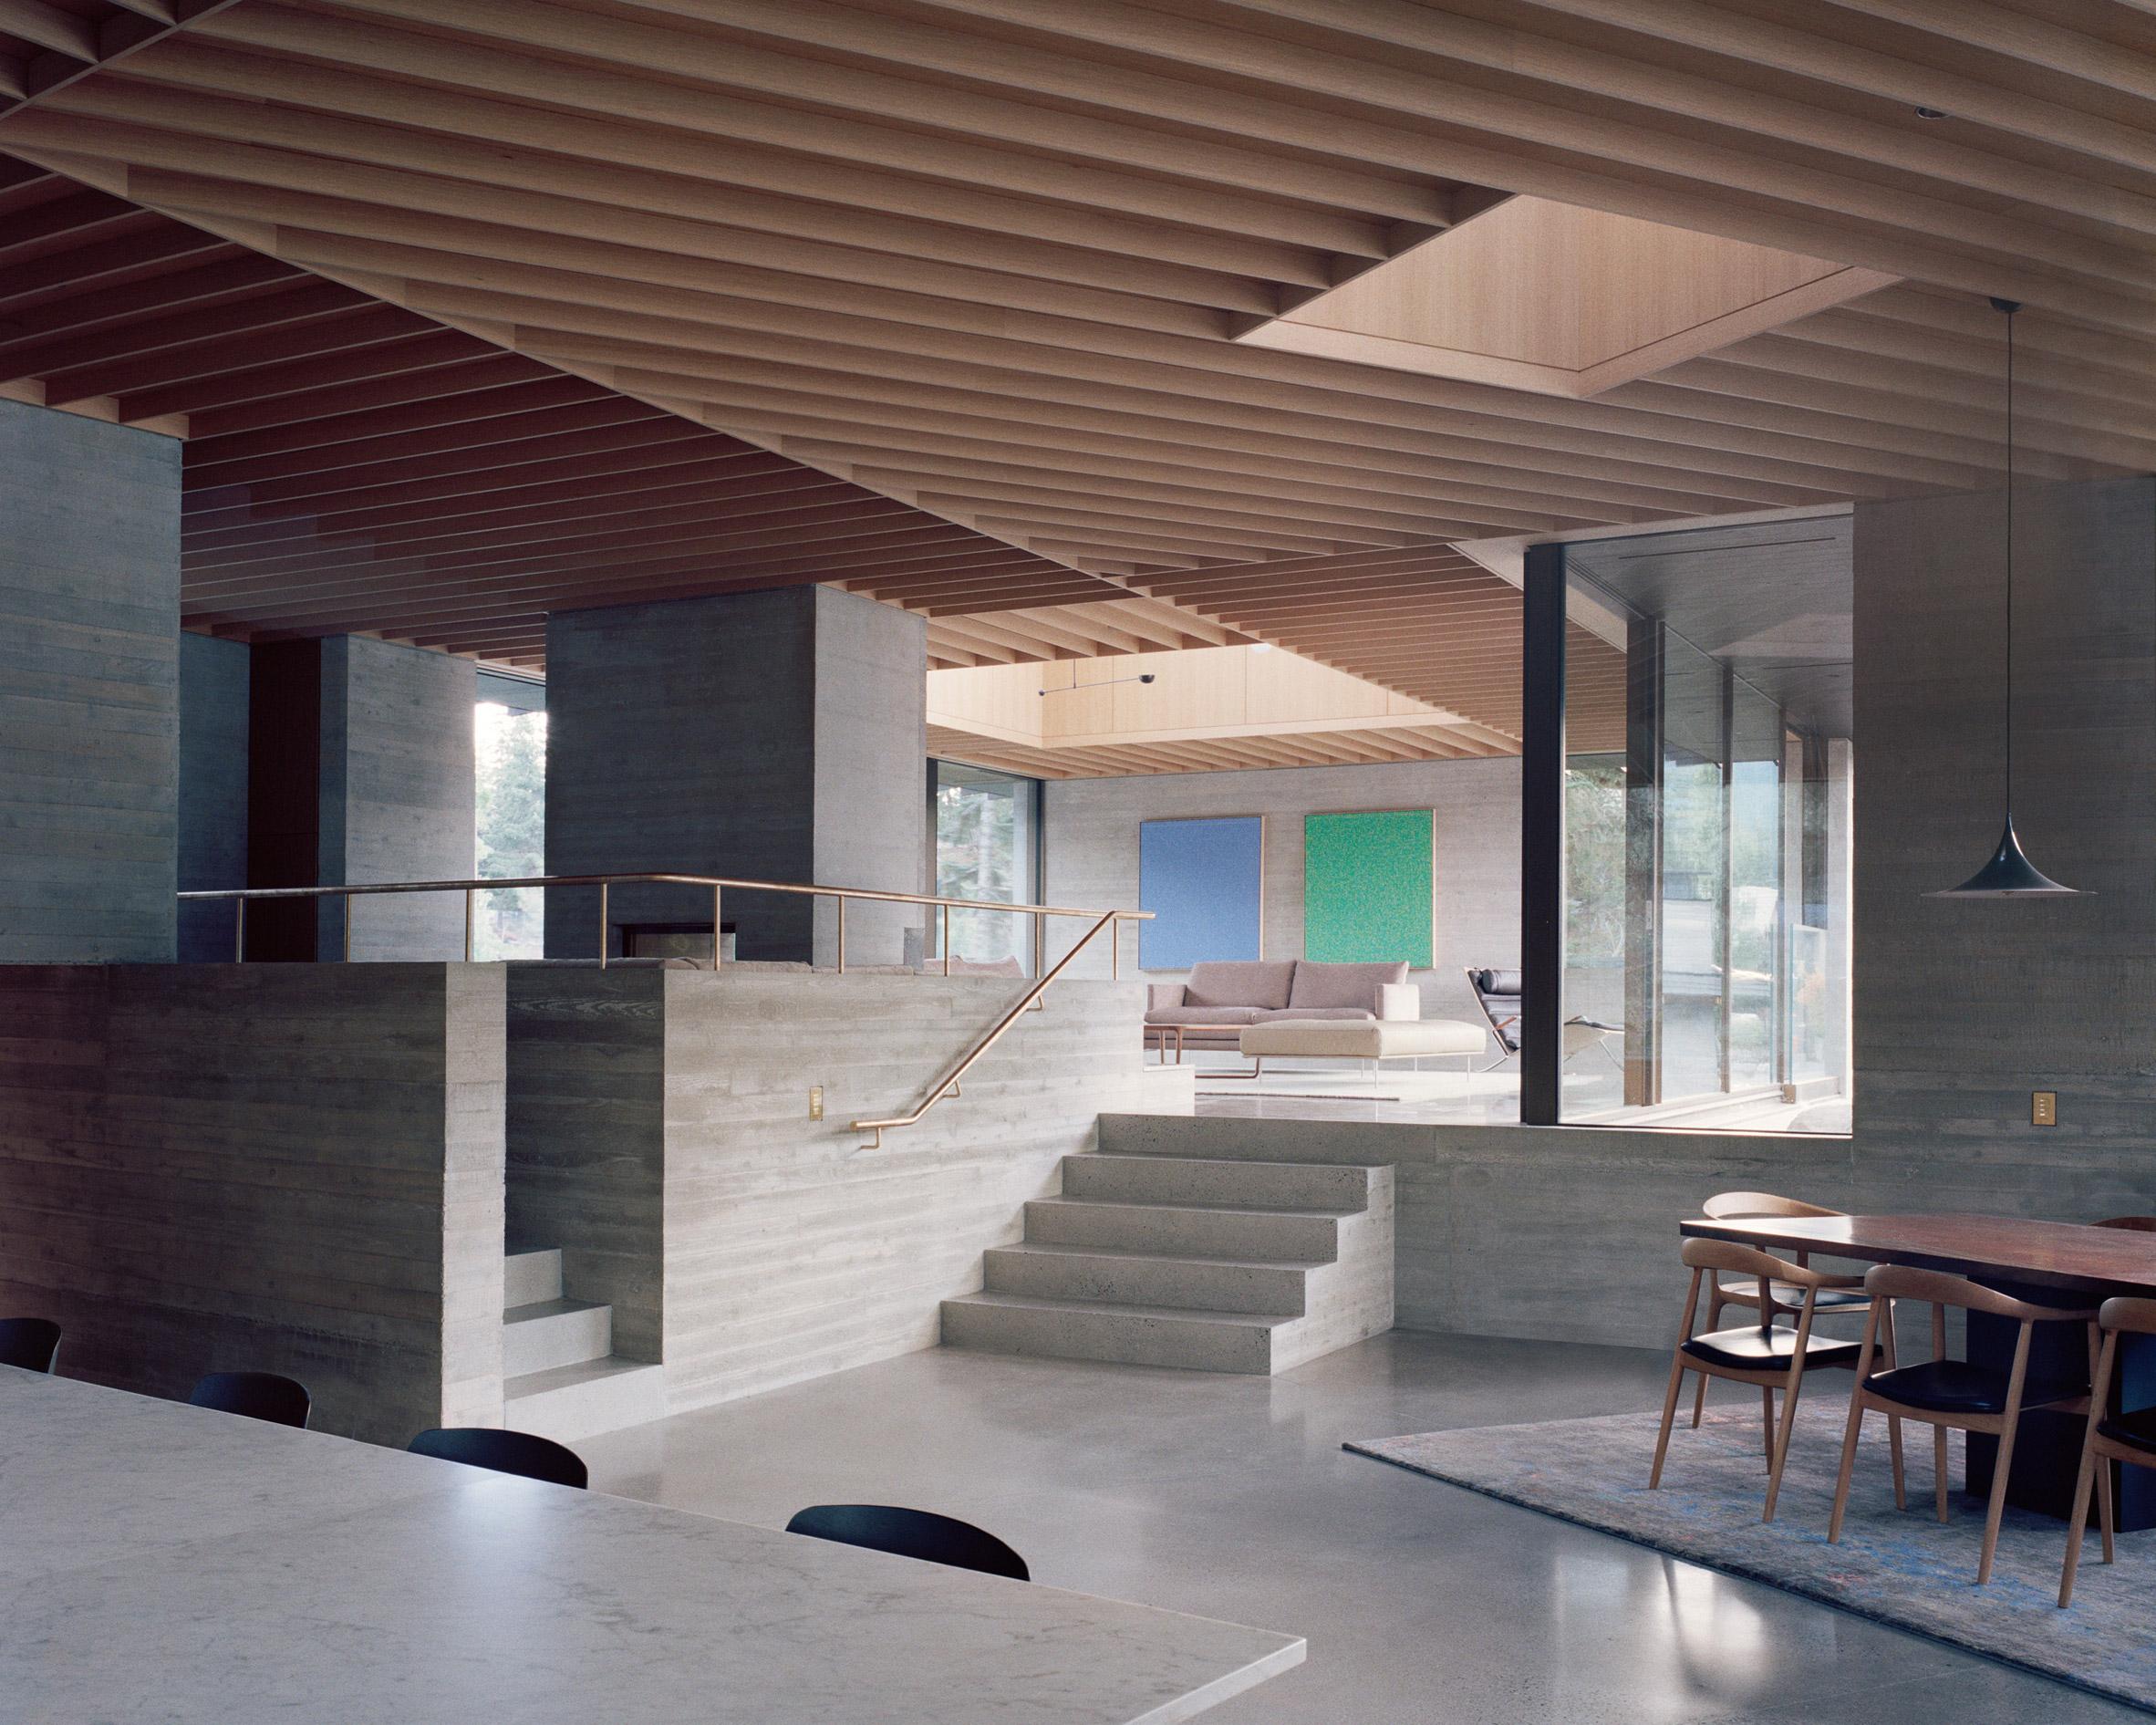 Living room, The Rock house in Whistler by Gort Scott